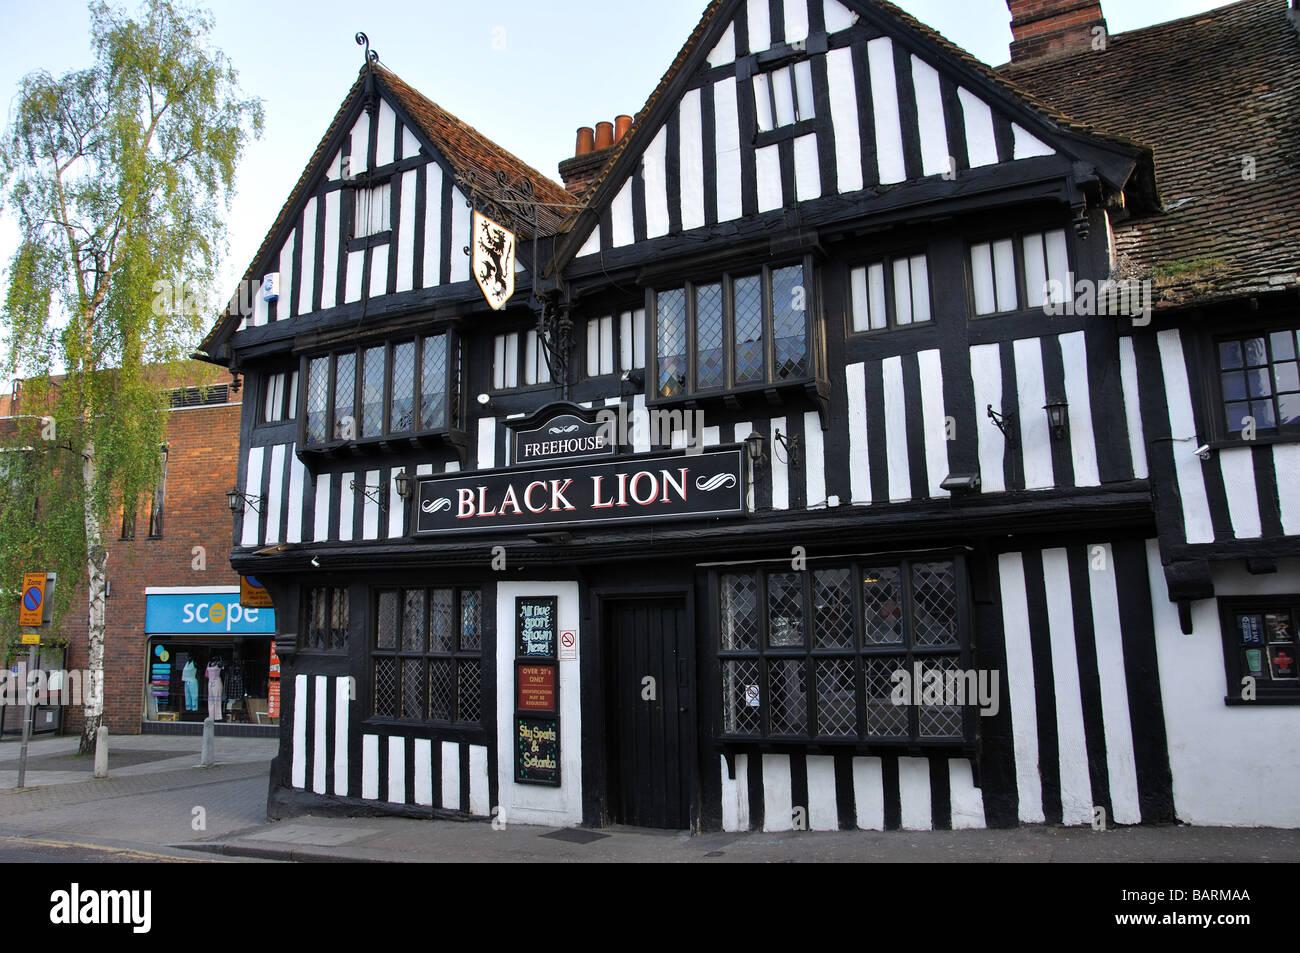 The Black Lion, Bridge Street, Bishop's Stortford, Hertfordshire, England, United Kingdom - Stock Image